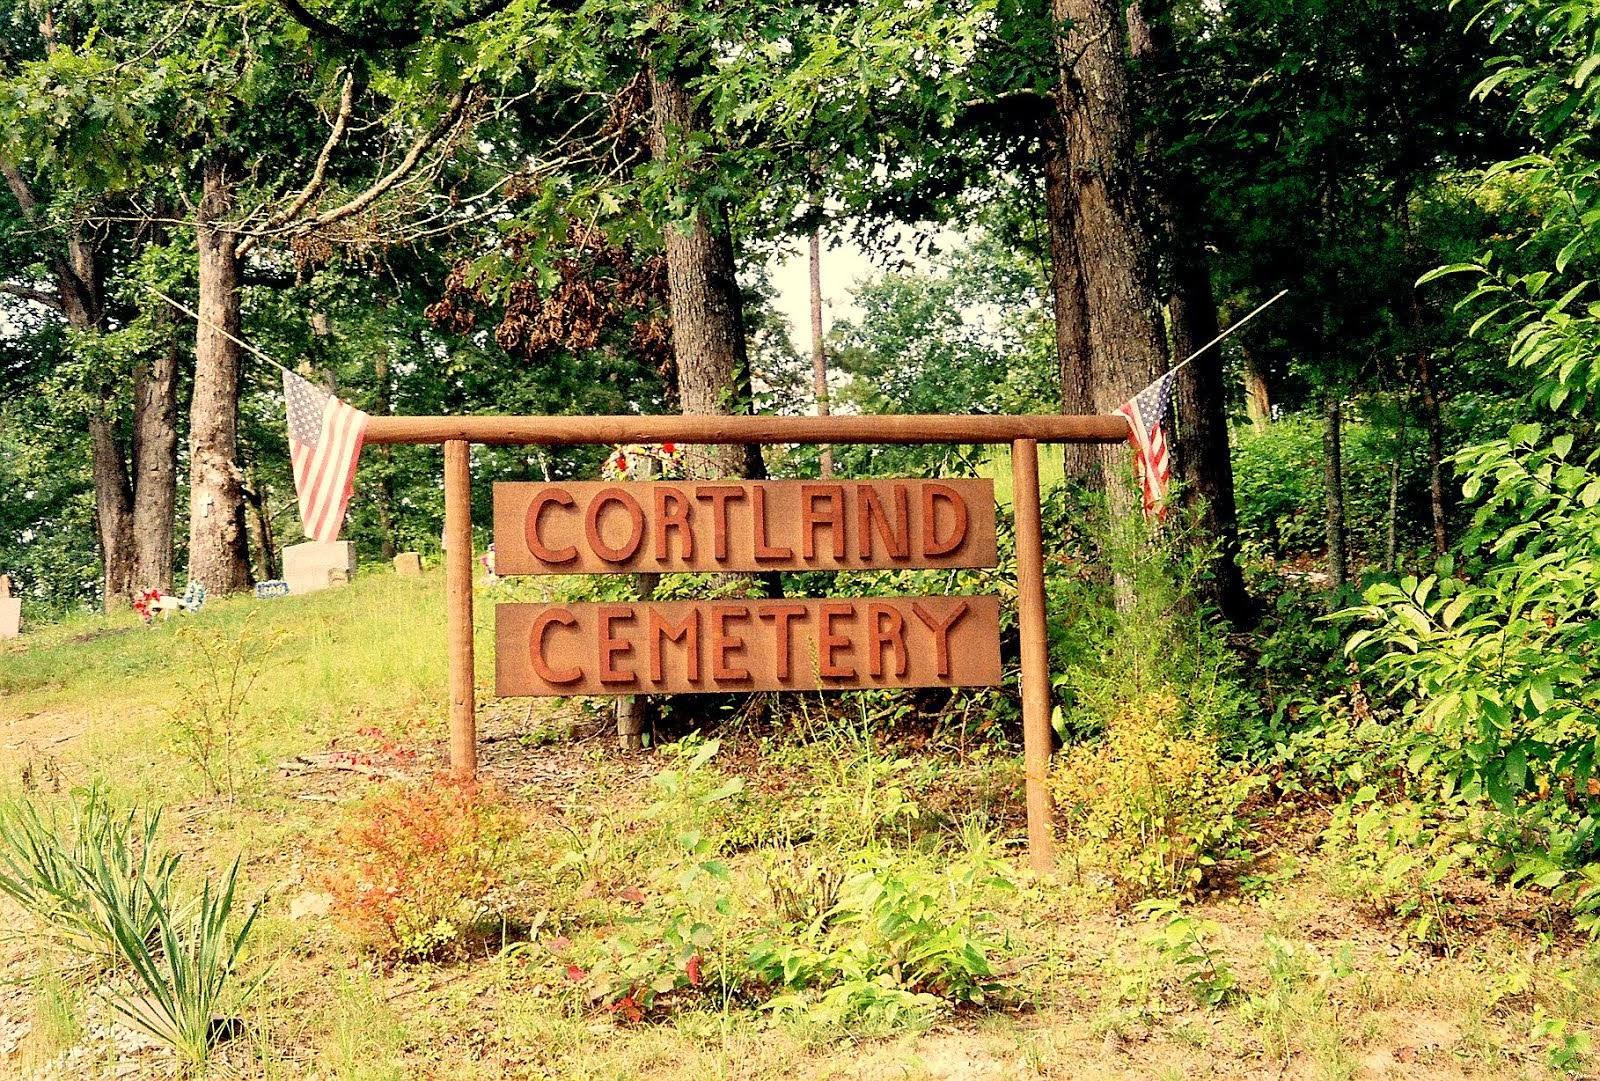 Cortland Cemetary